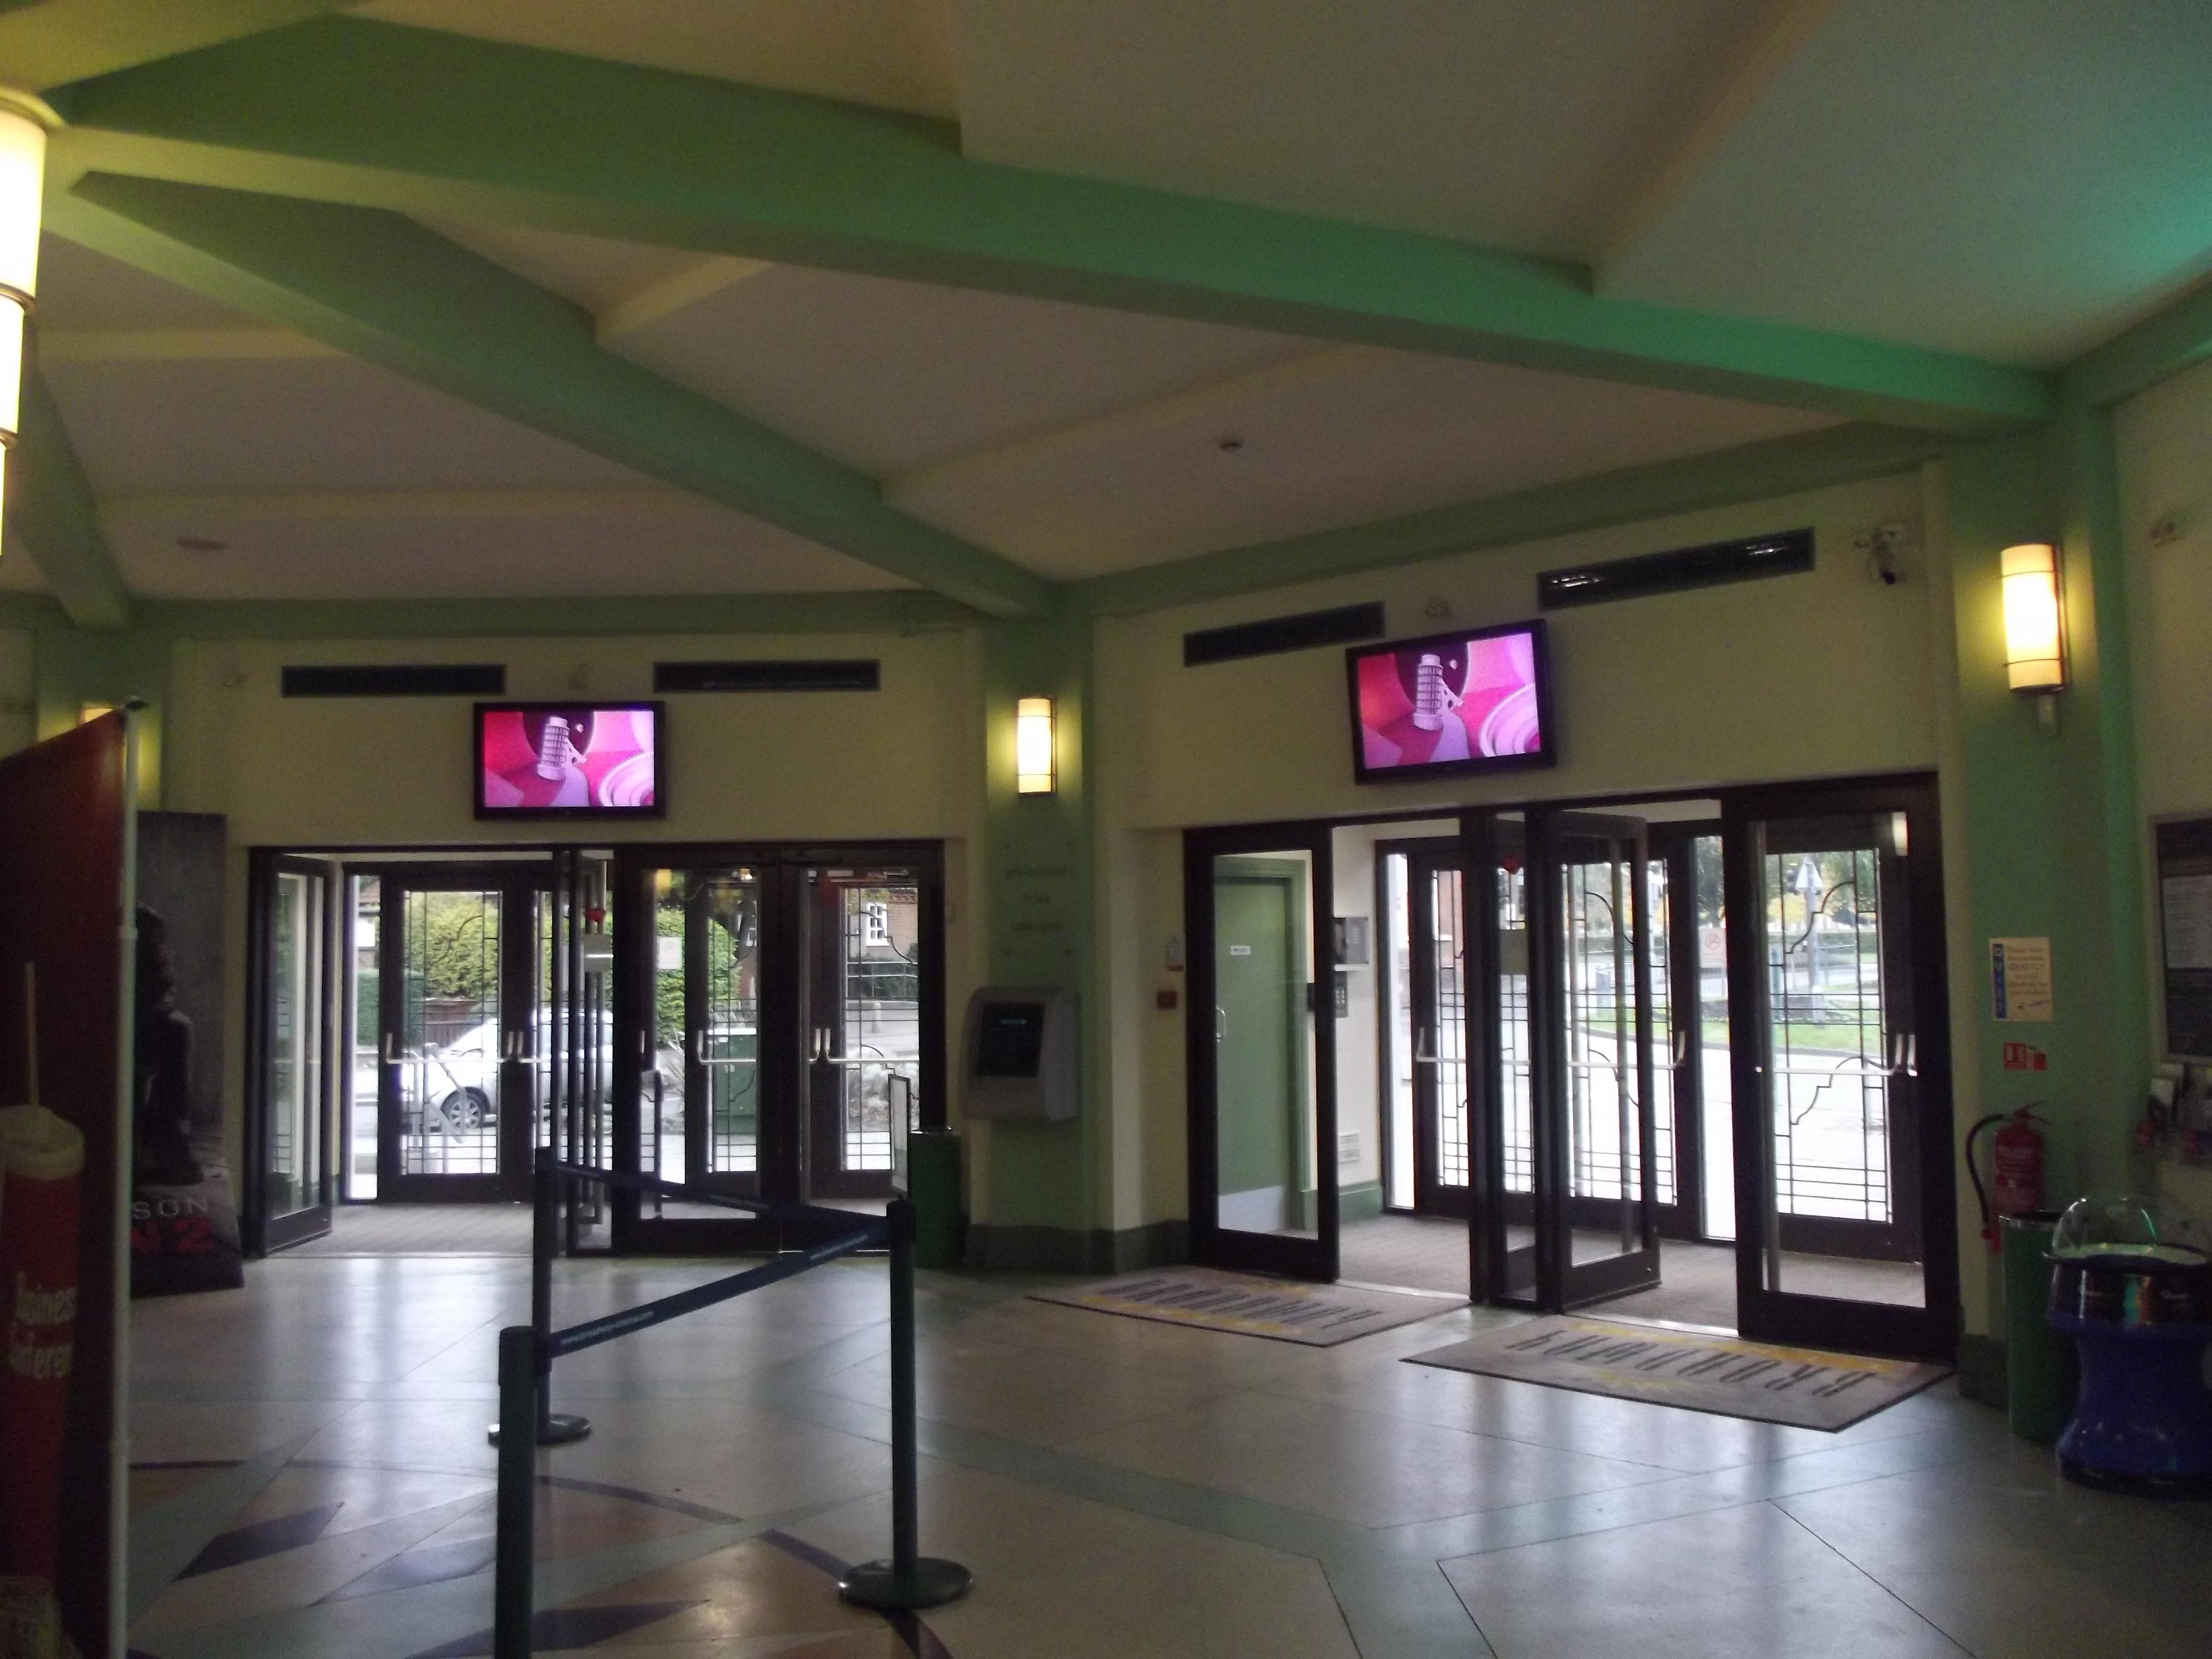 digital information displays